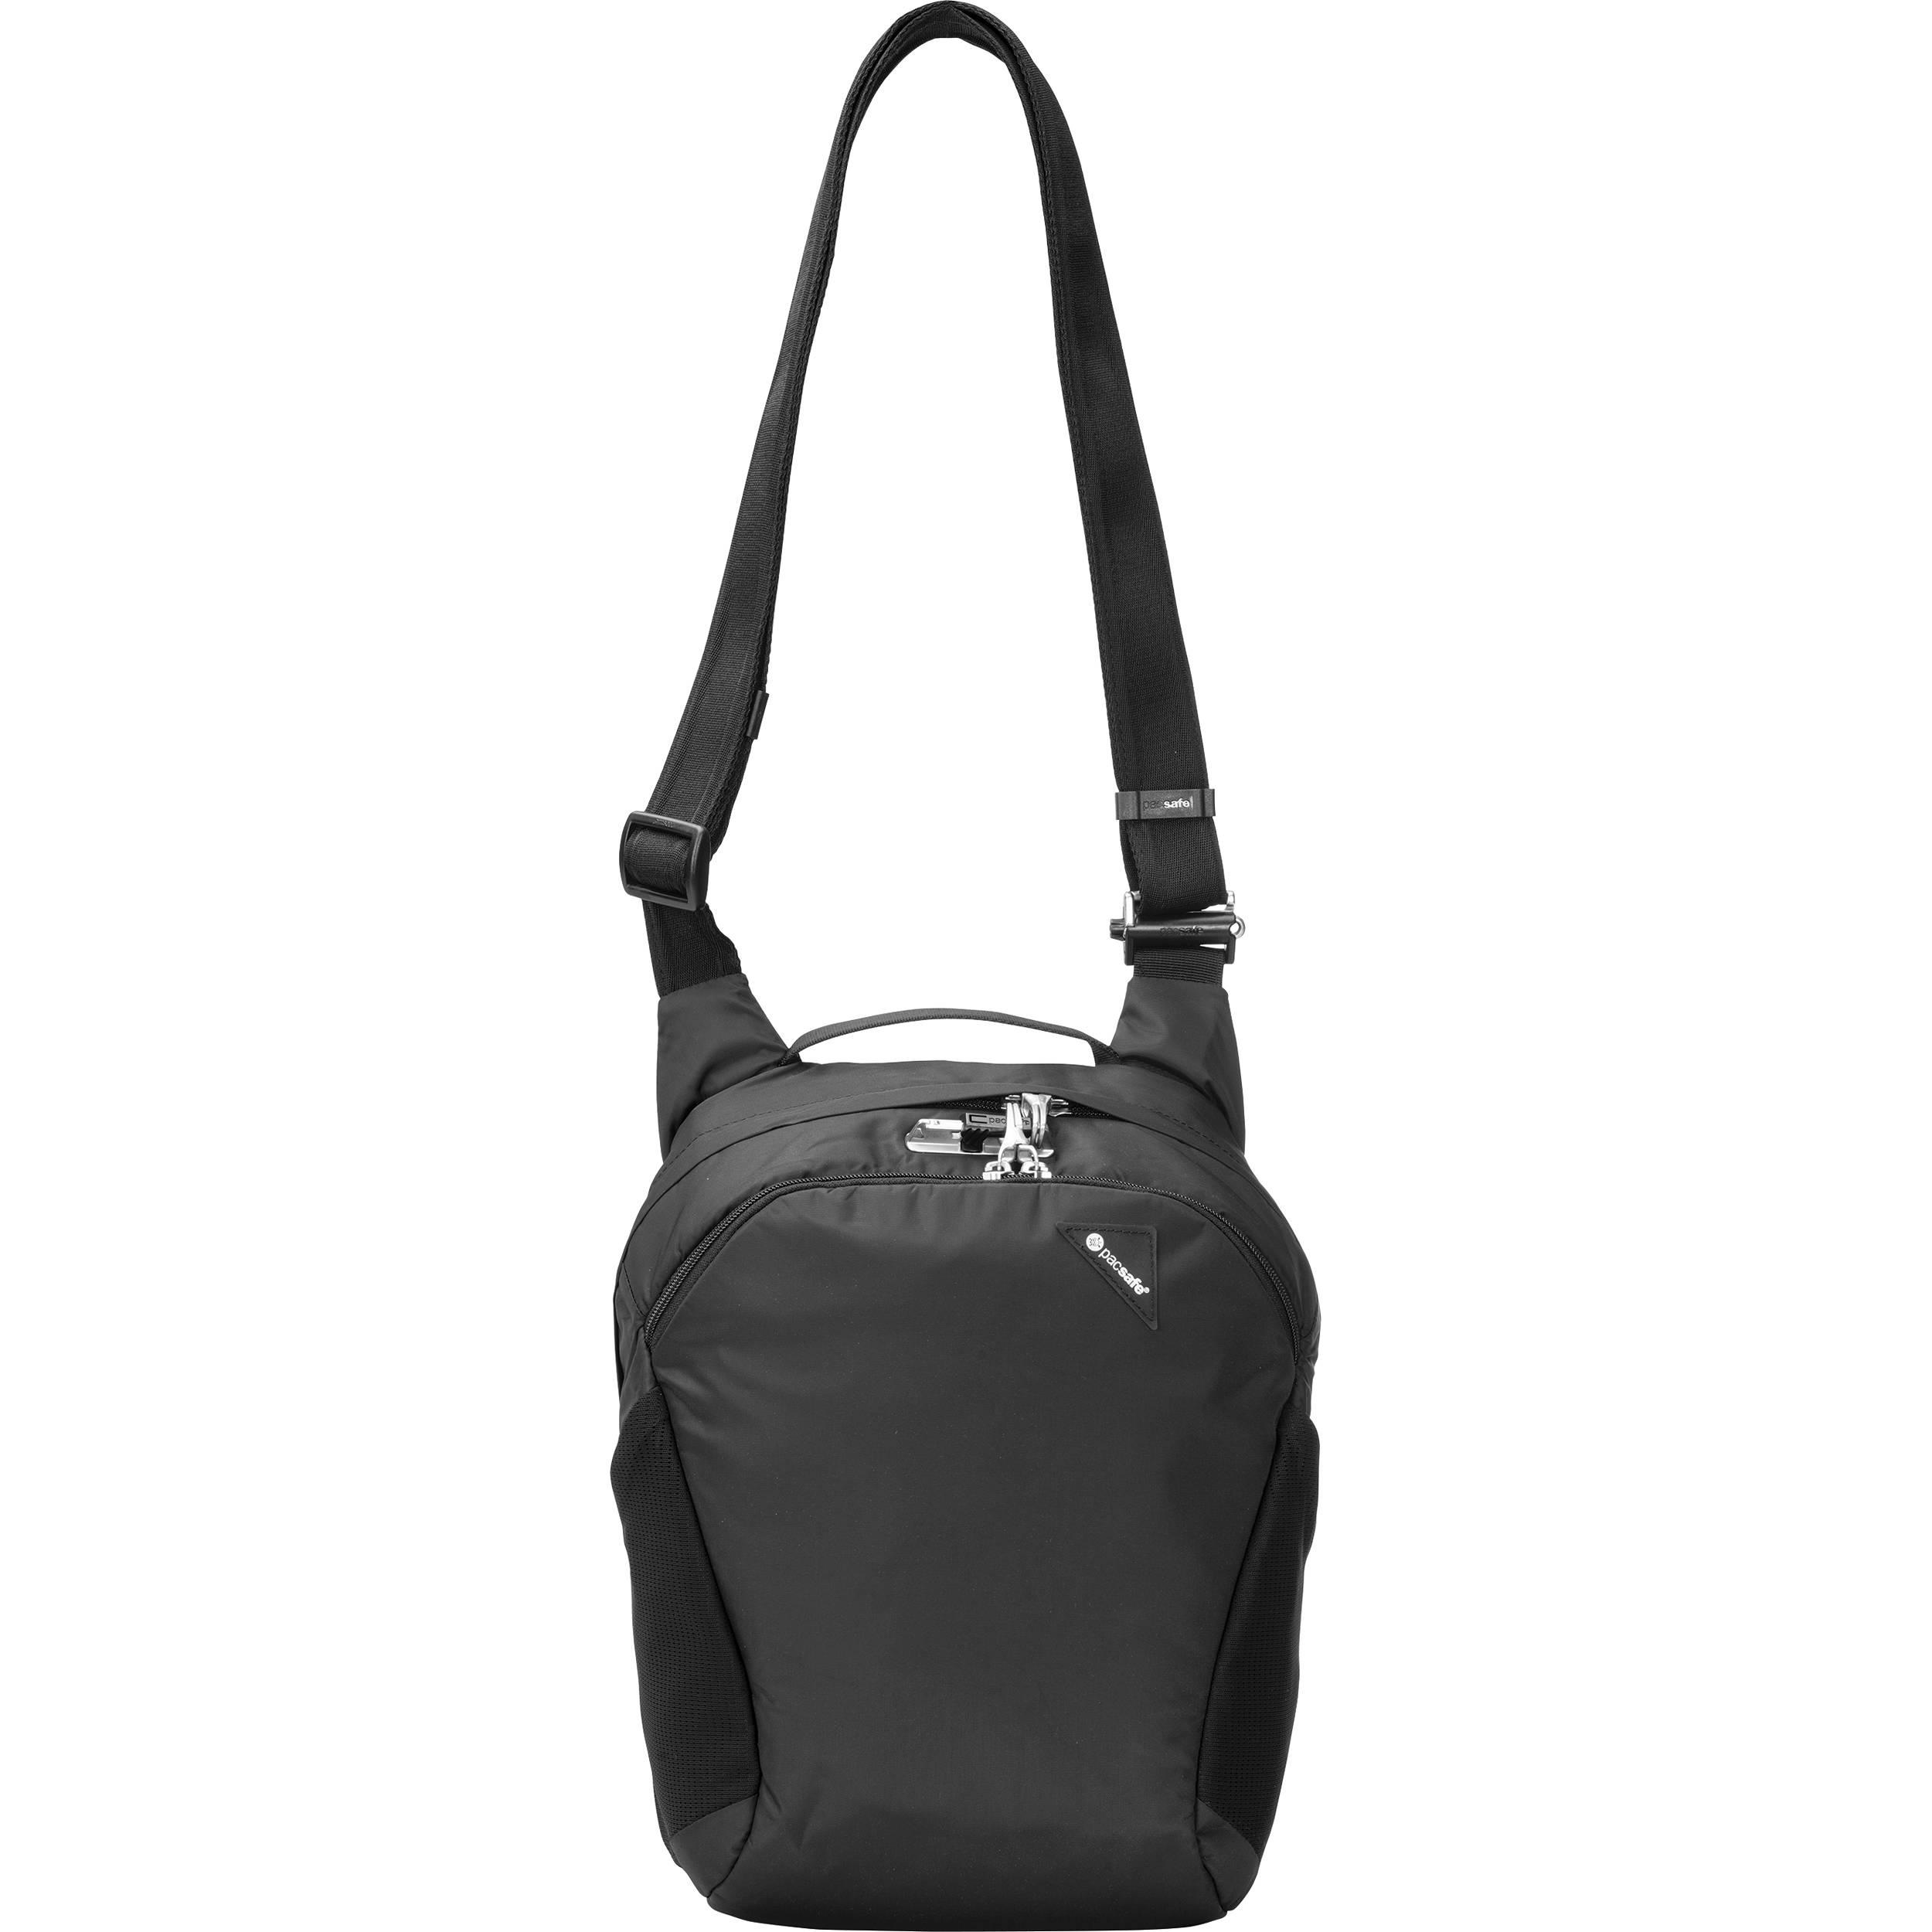 Pacsafe Vibe 300 Anti Theft Travel Bag